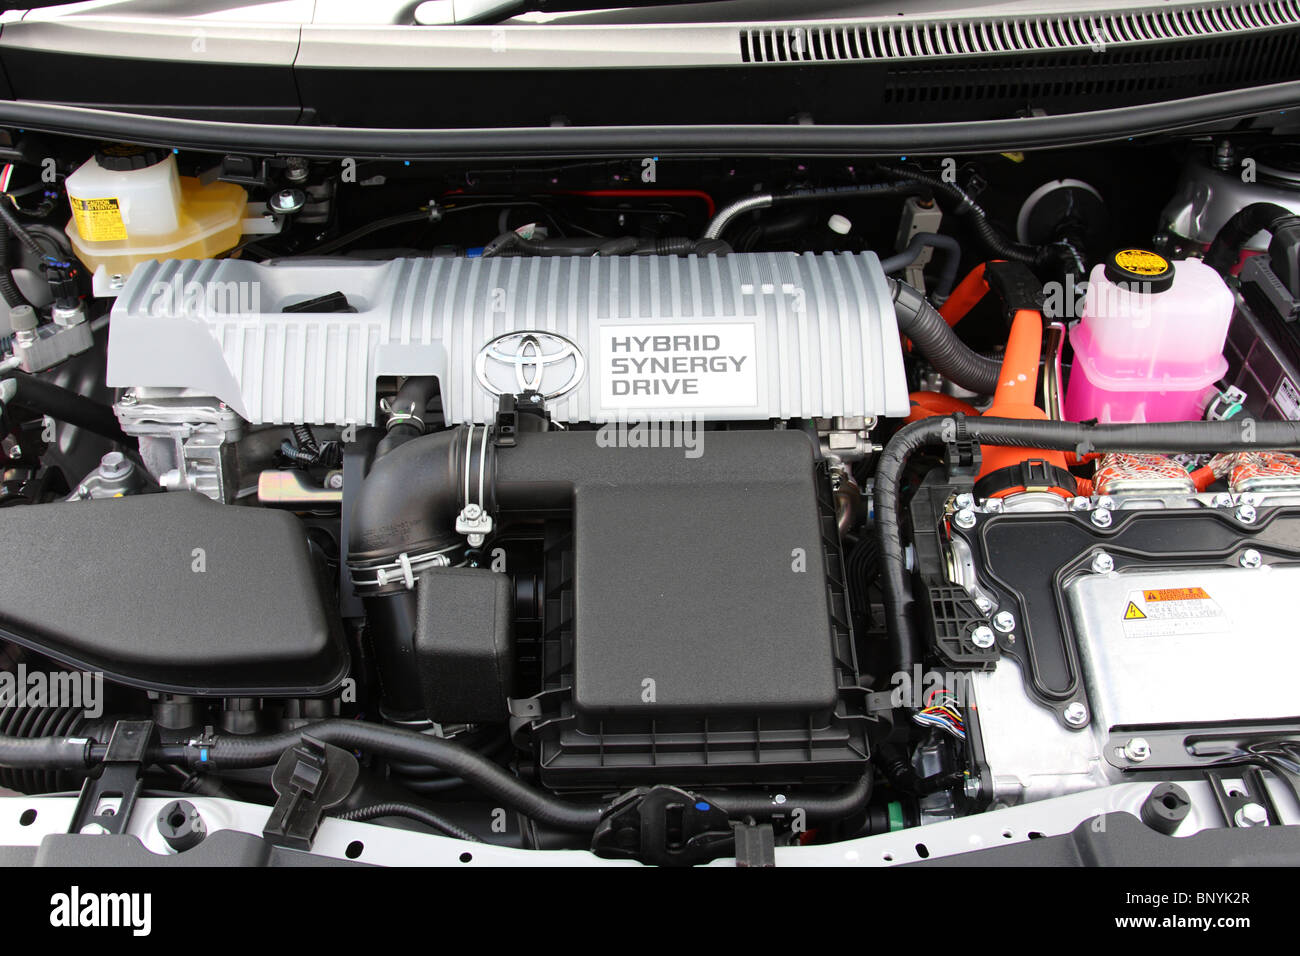 Una Toyota Hybrid Engine. Immagini Stock